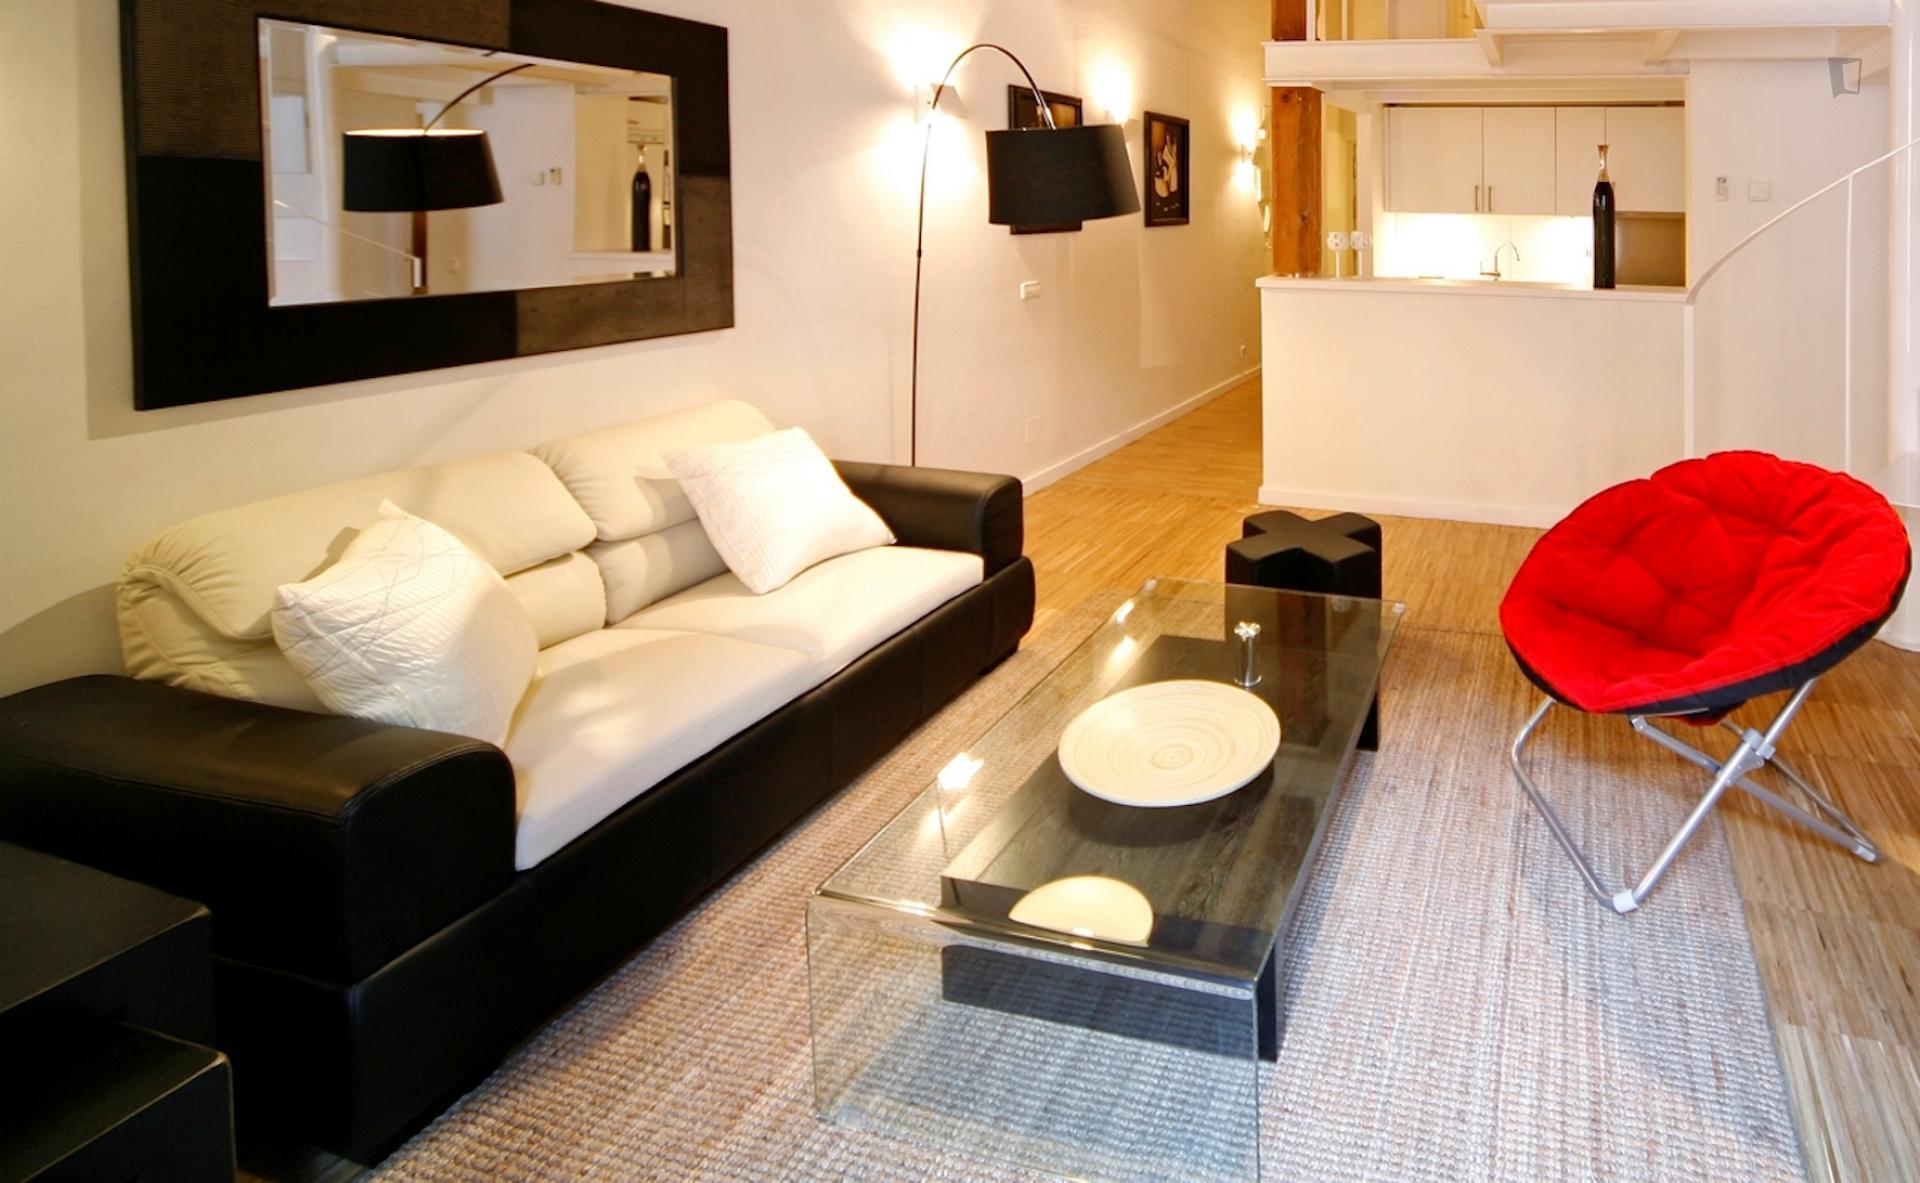 Atocha - 3 bedroom flat in Madrid